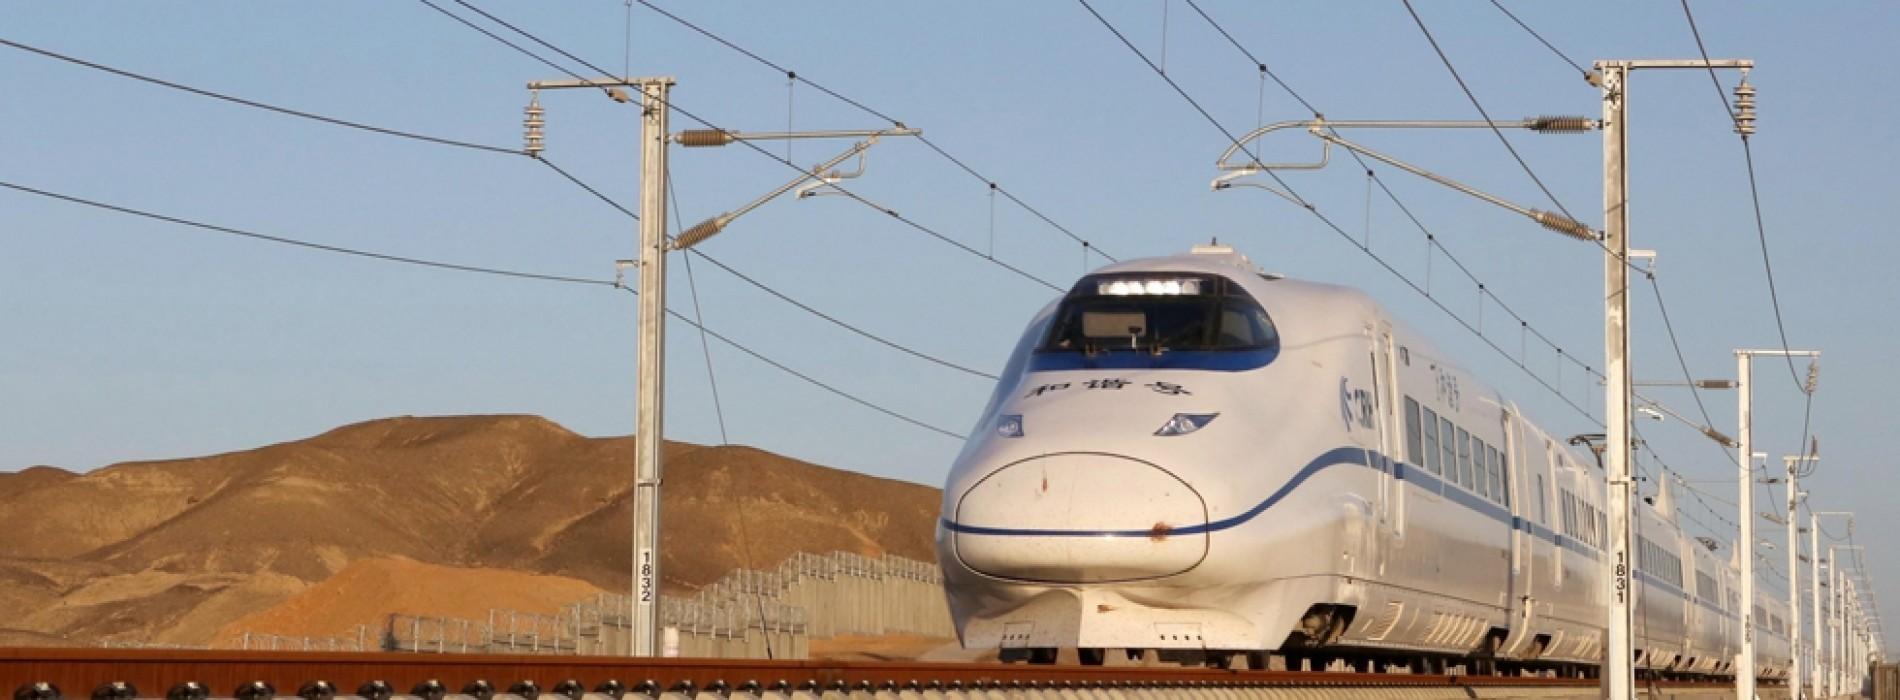 Railways to use hi-tech survey for high-speed train corridor